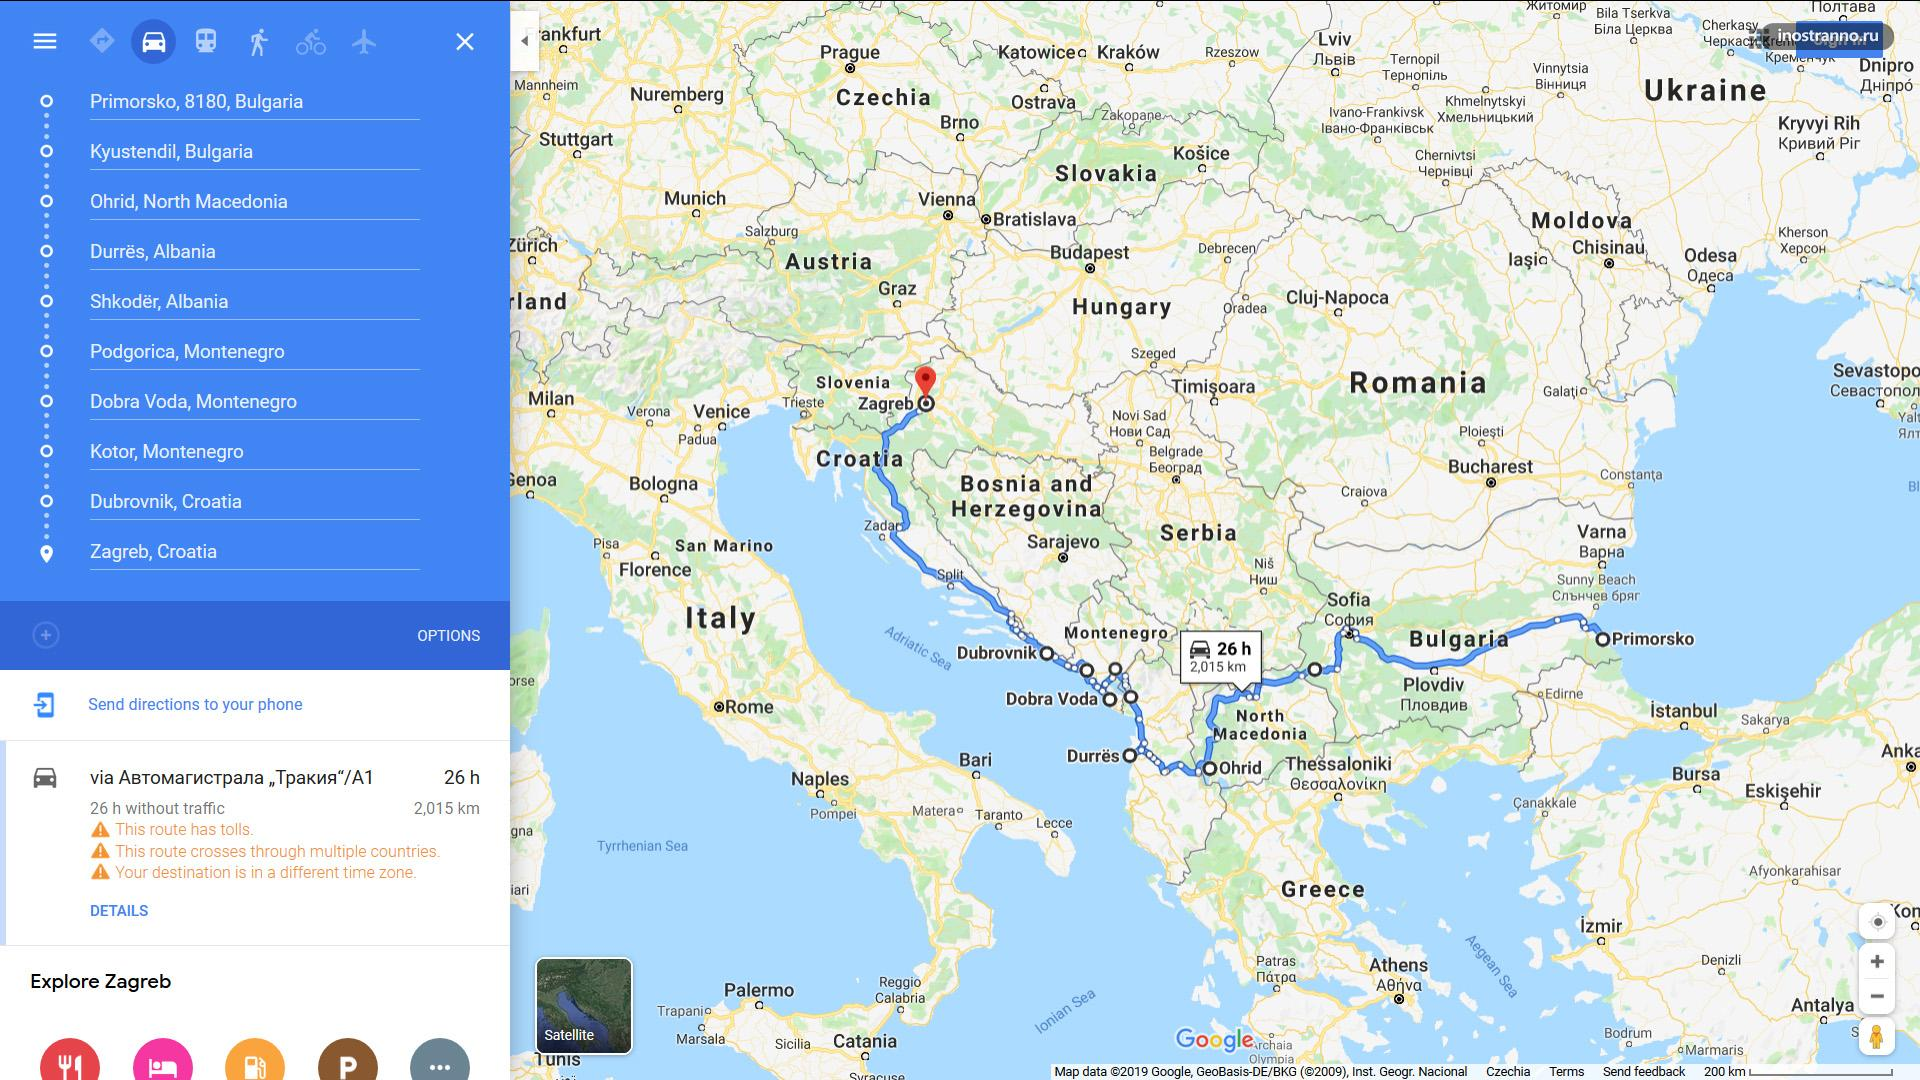 Маршрут автопутешествия по Балканам